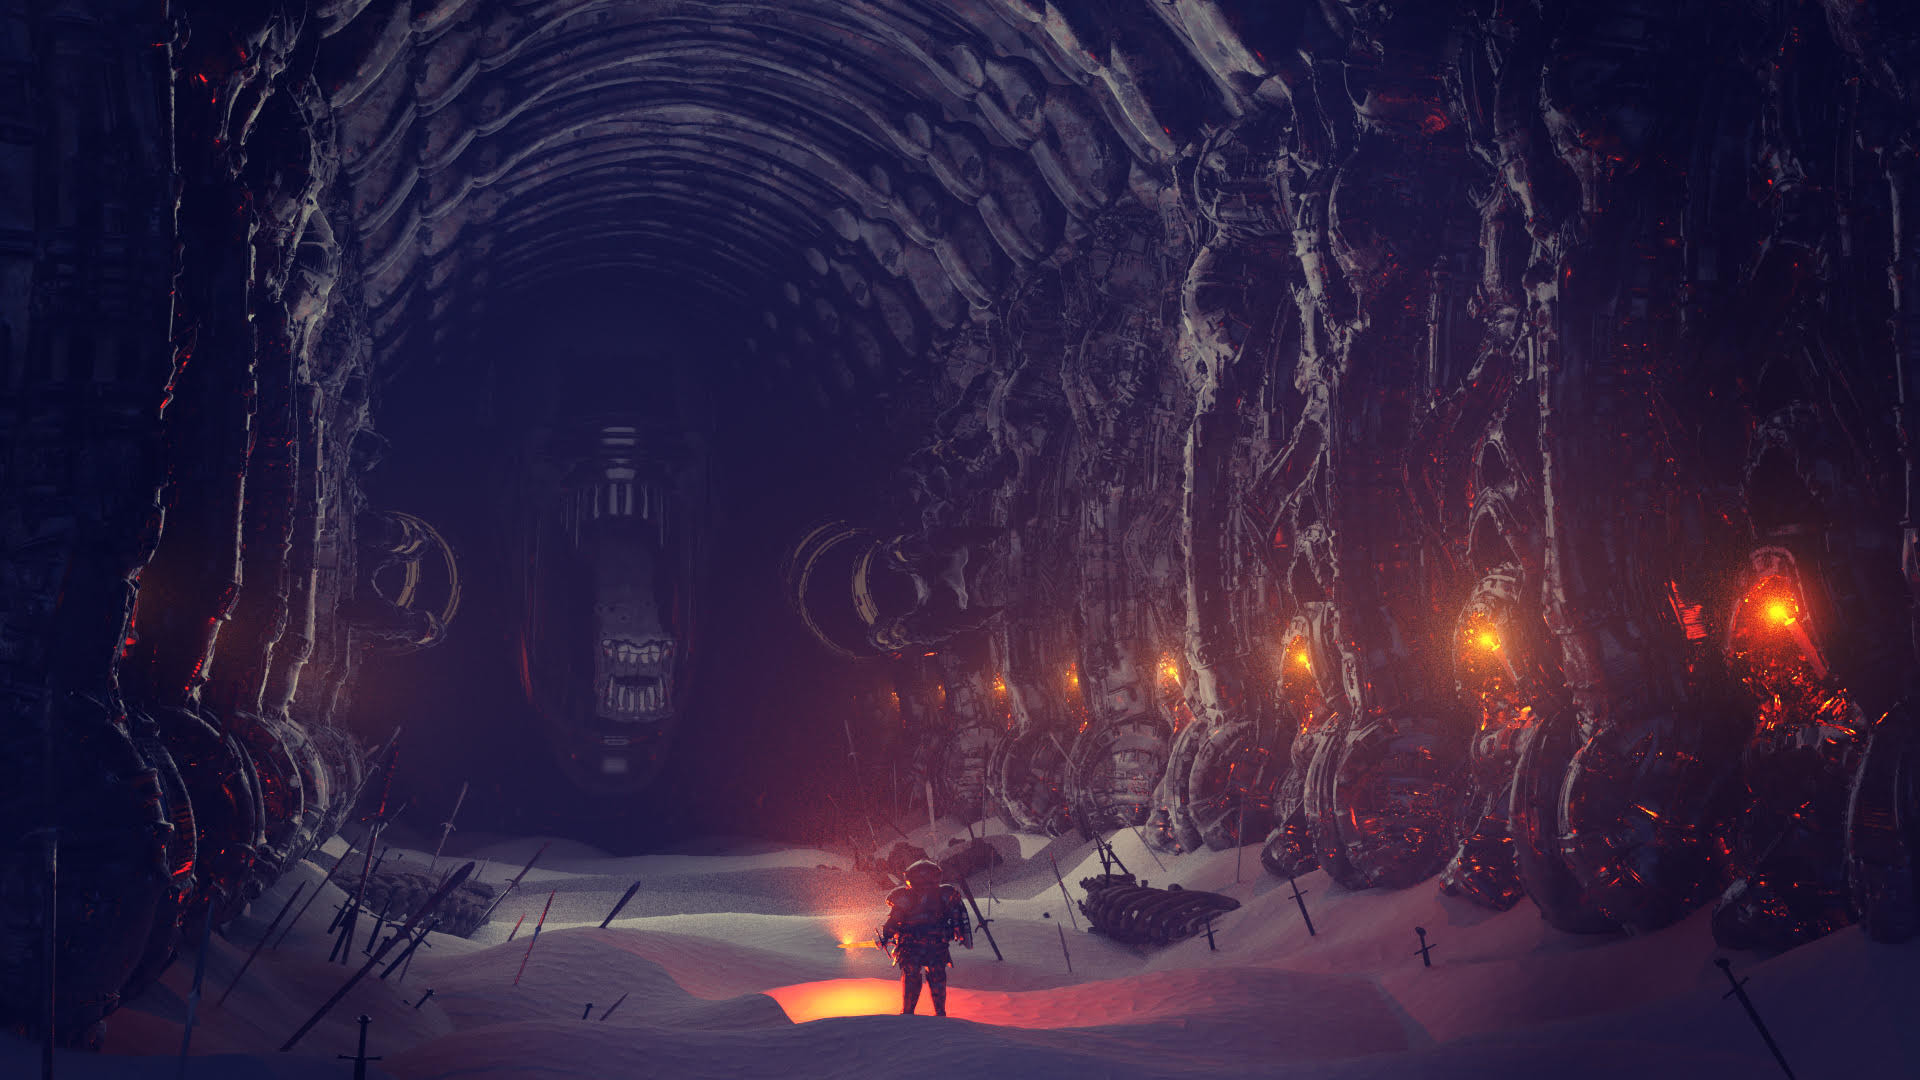 Ben nicholas bennicholas aliens darksouls lordacheron 02